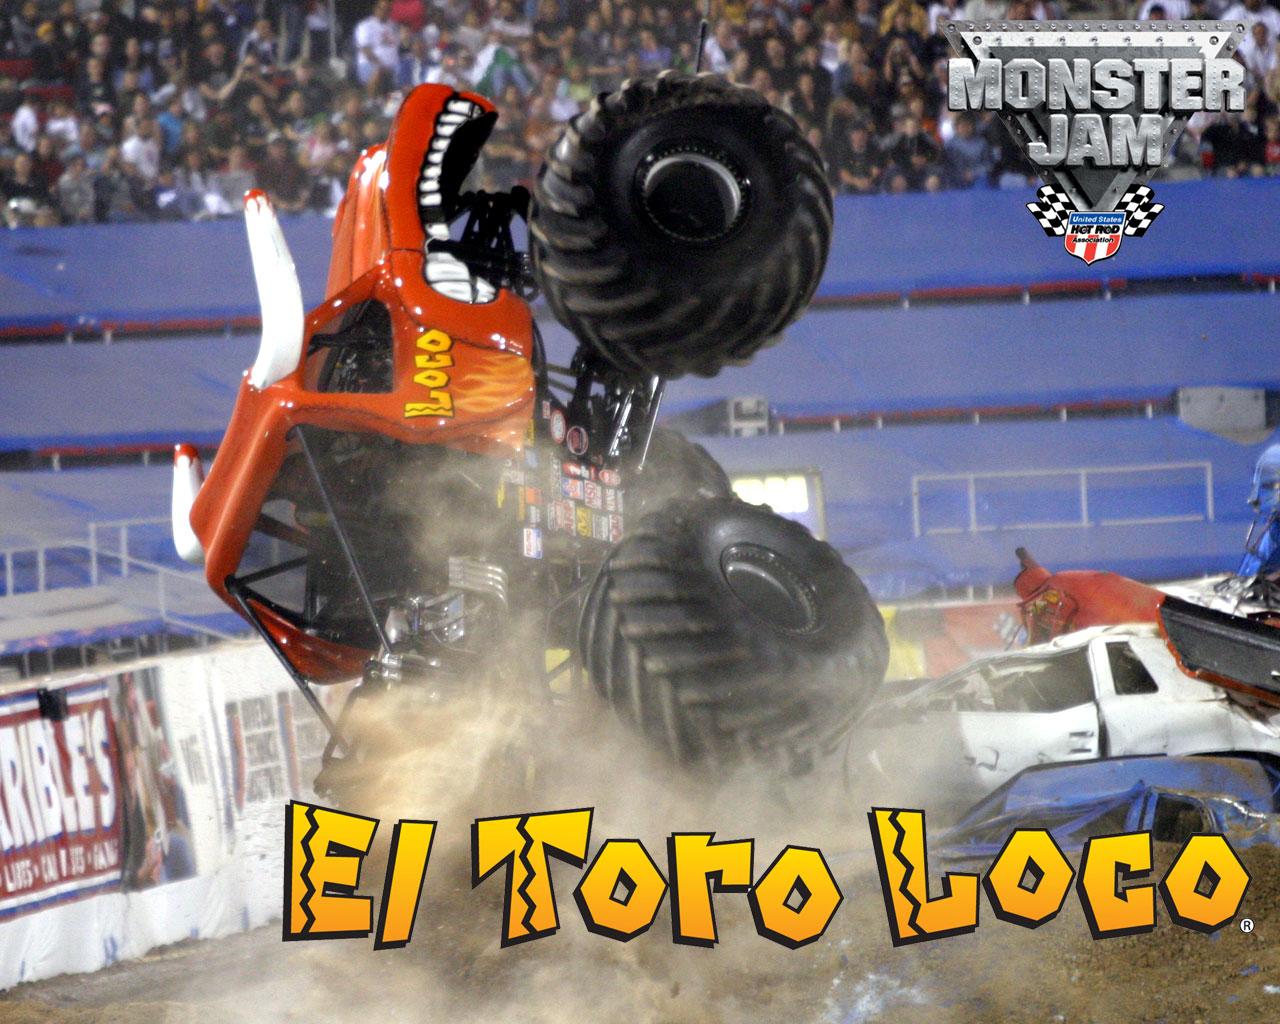 EL TORO LOCO 1280x1024